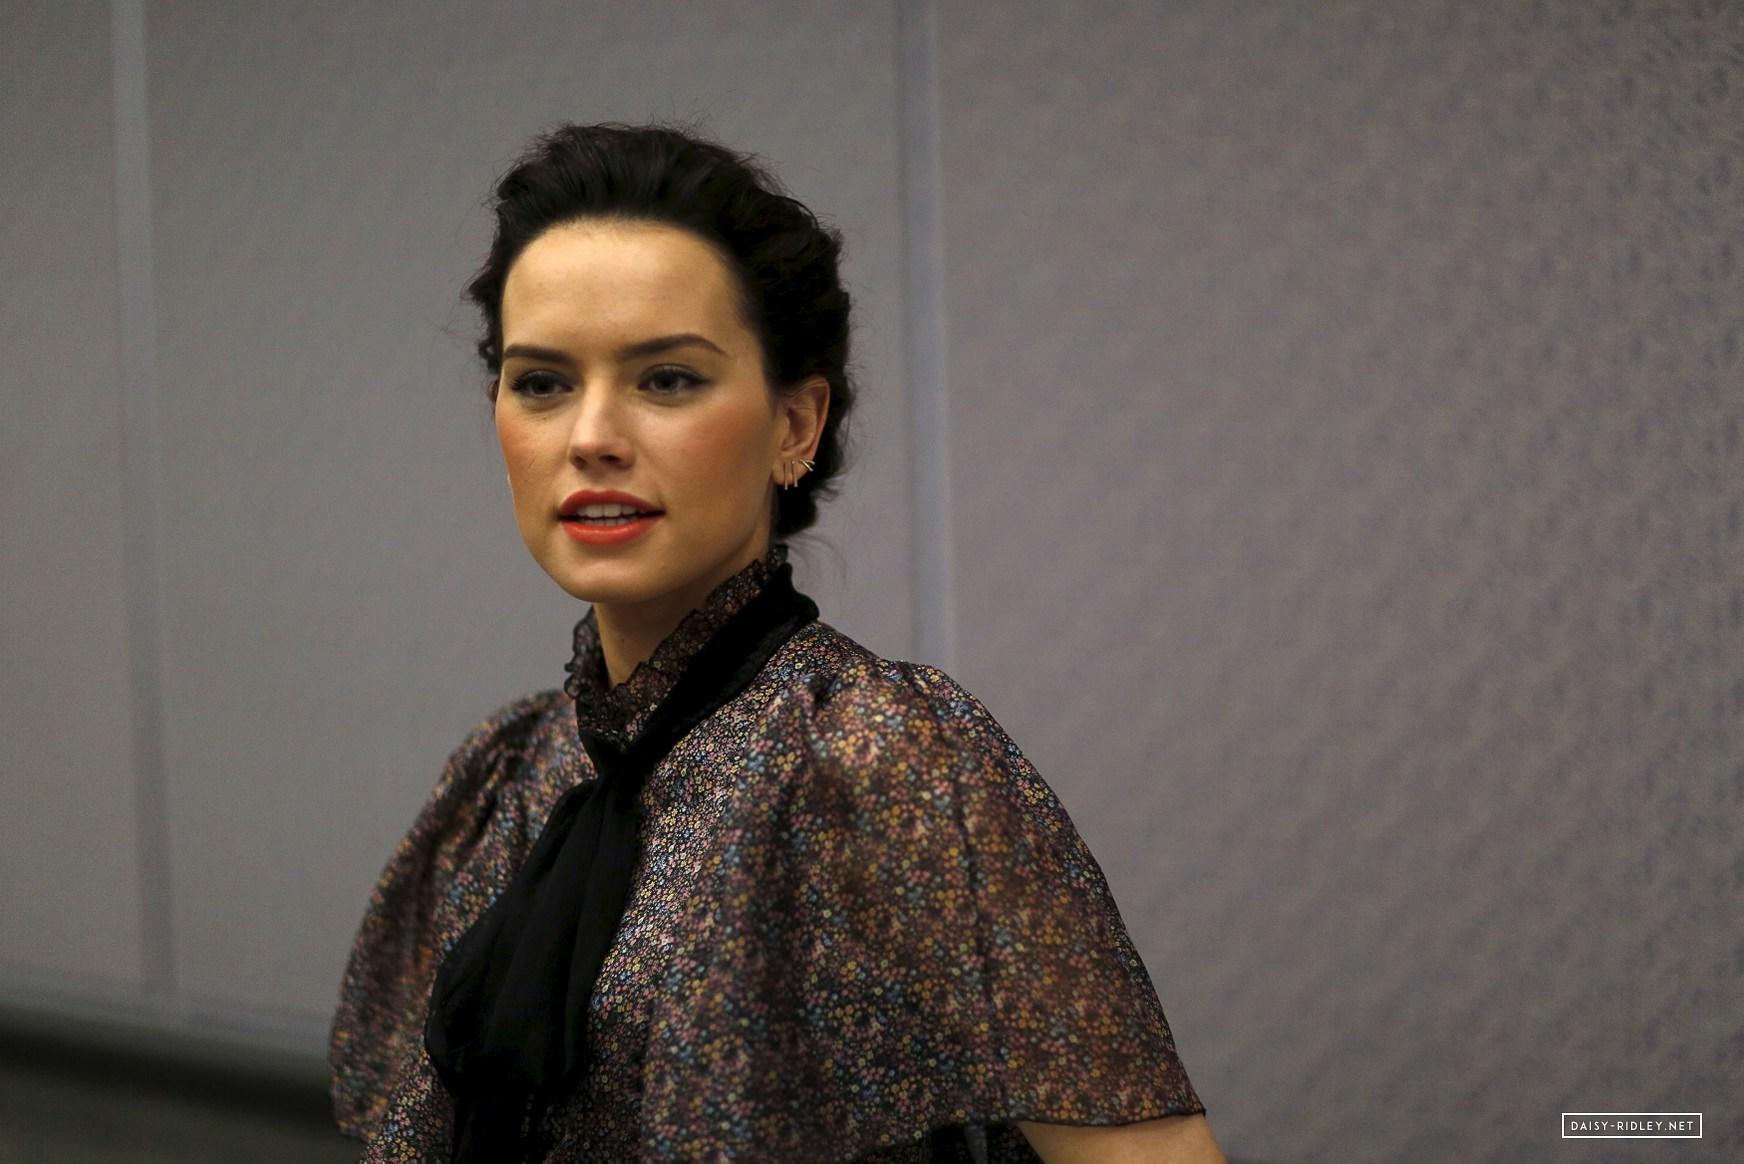 Star Wars Daisy Ridley The Force Awakens Press Conference 1744x1164 Wallpaper Teahub Io